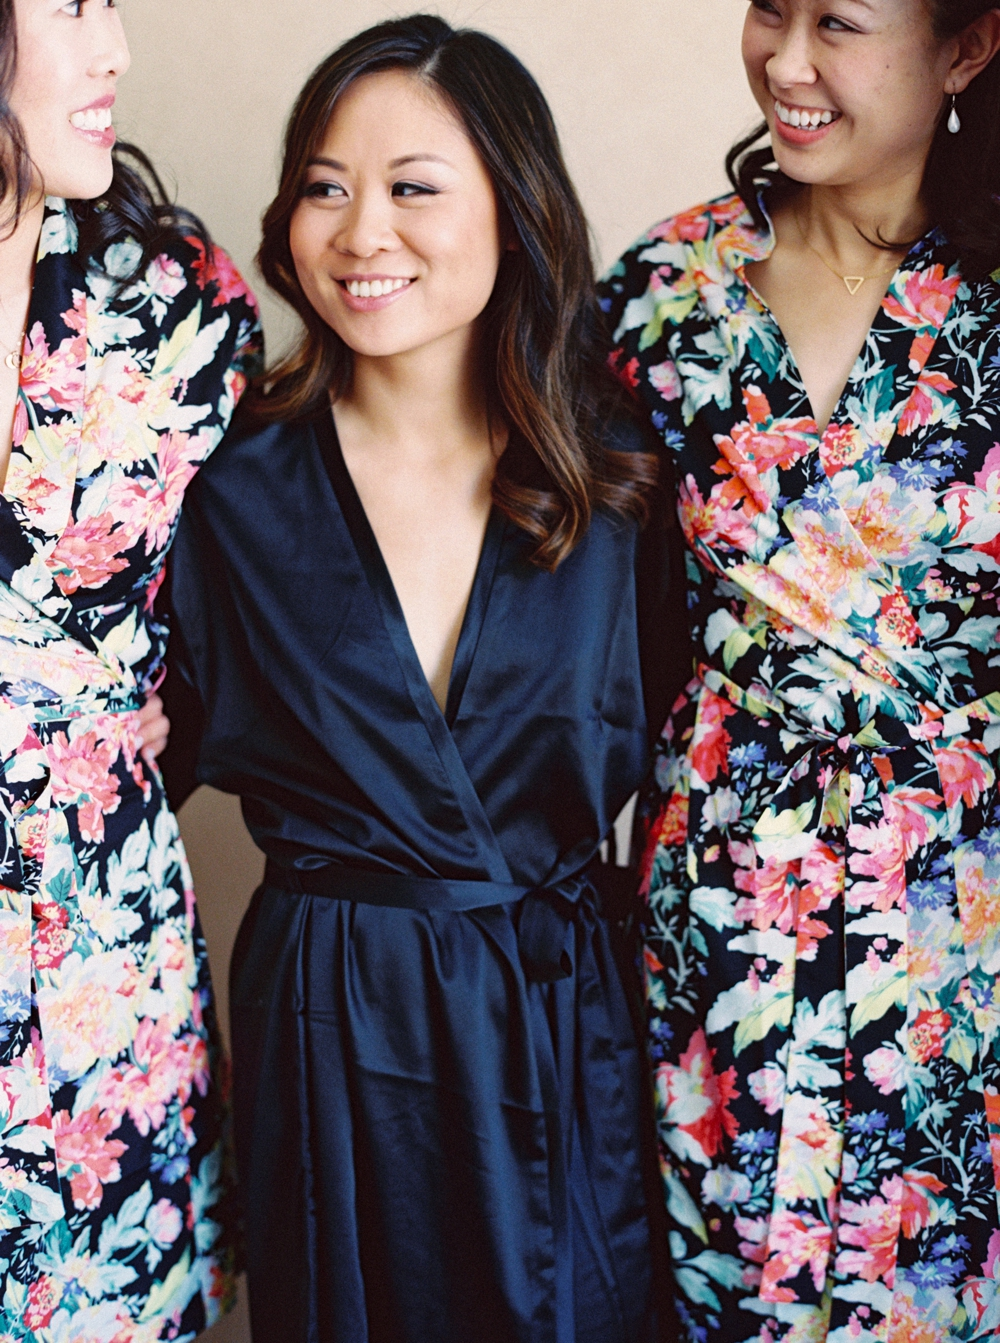 Calgary Wedding Photographer | Meadow Muse Pavilion Wedding | Canmore Photographers | bridesmaids robes